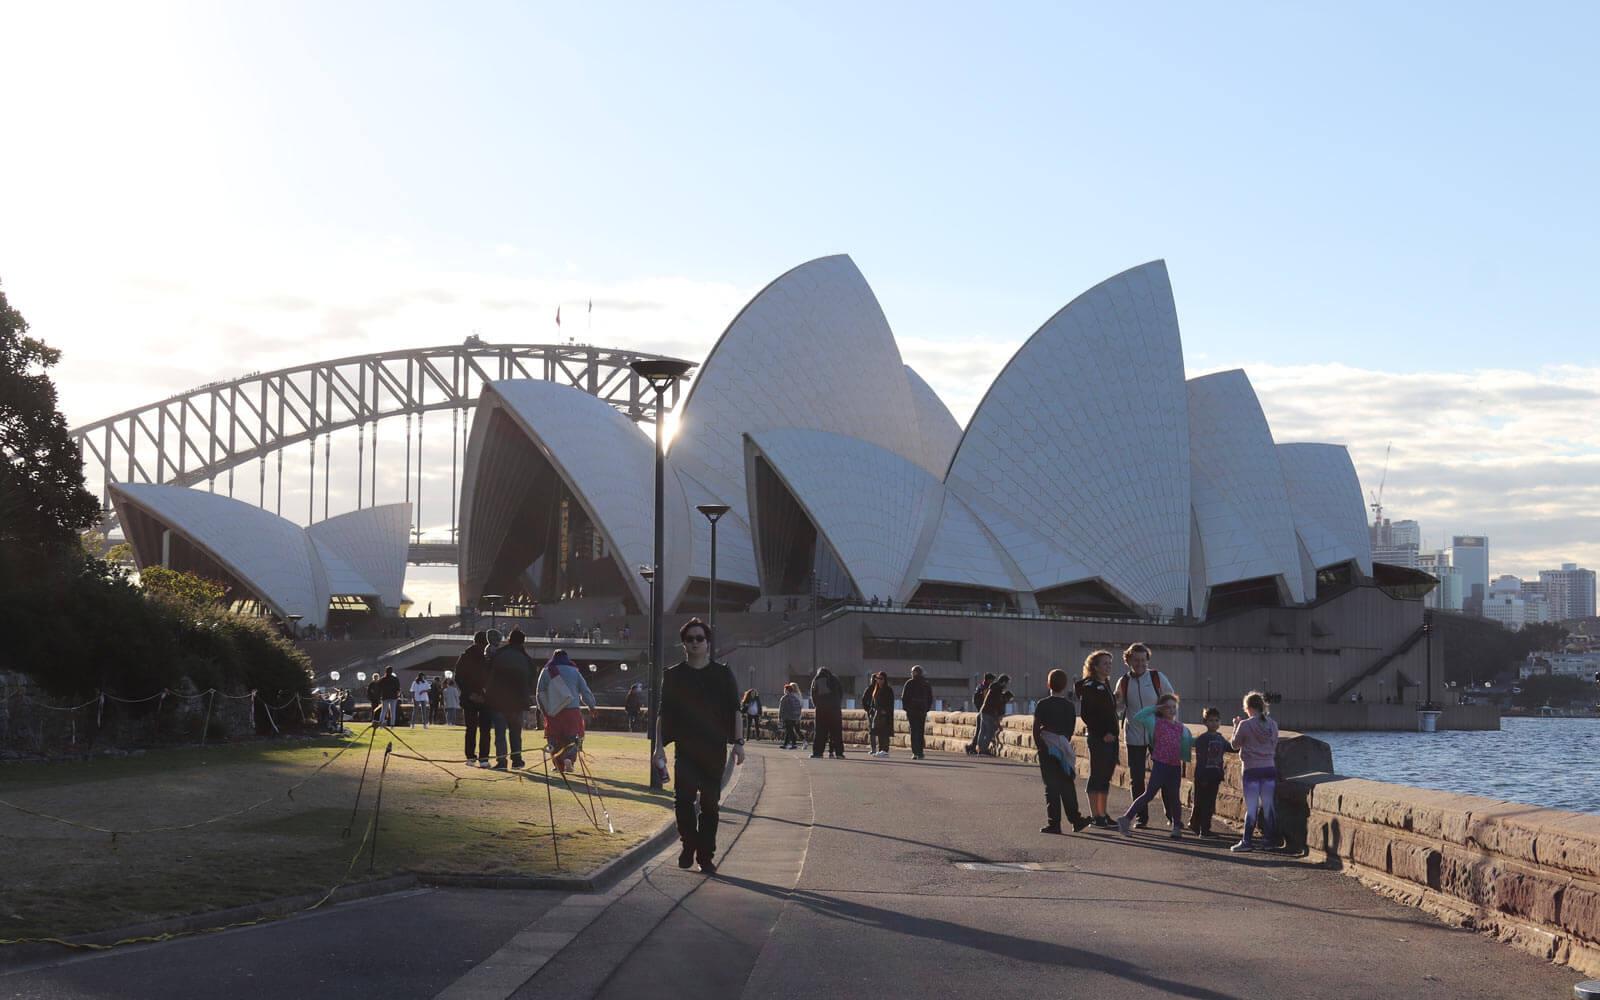 Schüleraustausch Australien: Blick auf das Sydney Opera House